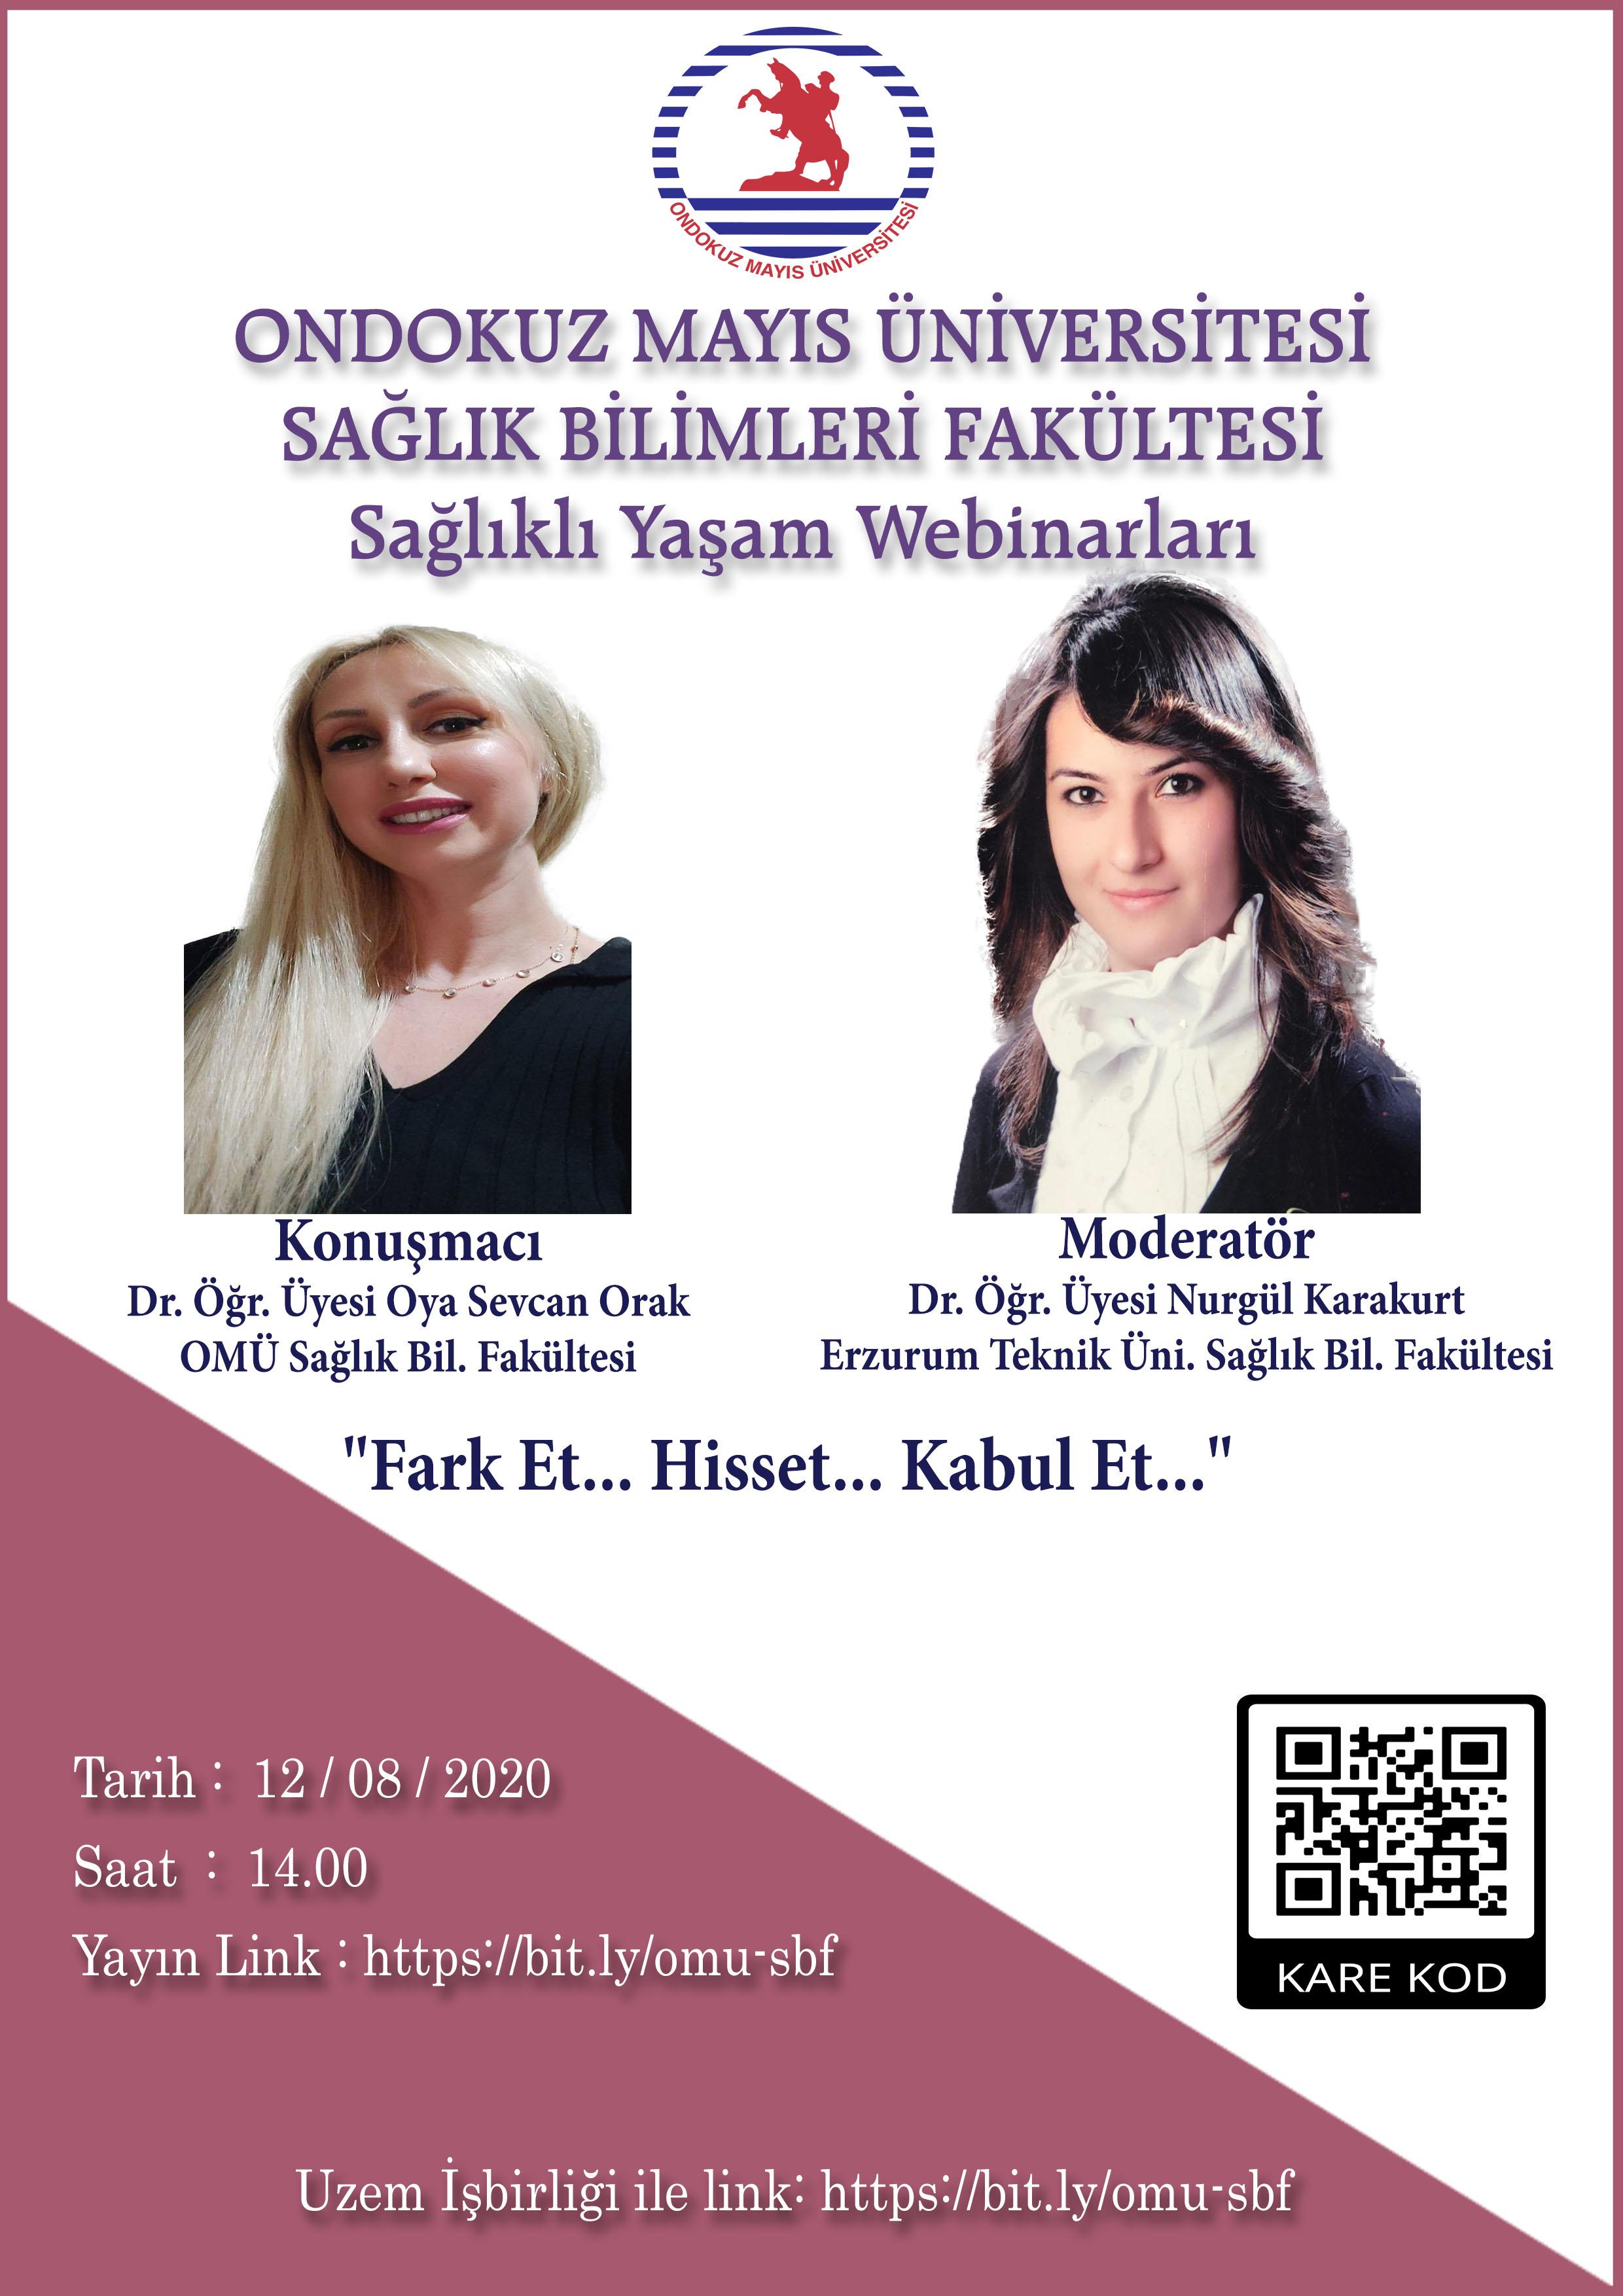 https://www.omu.edu.tr/sites/default/files/saglikli_yasam_webinarlari_-_6.jpg